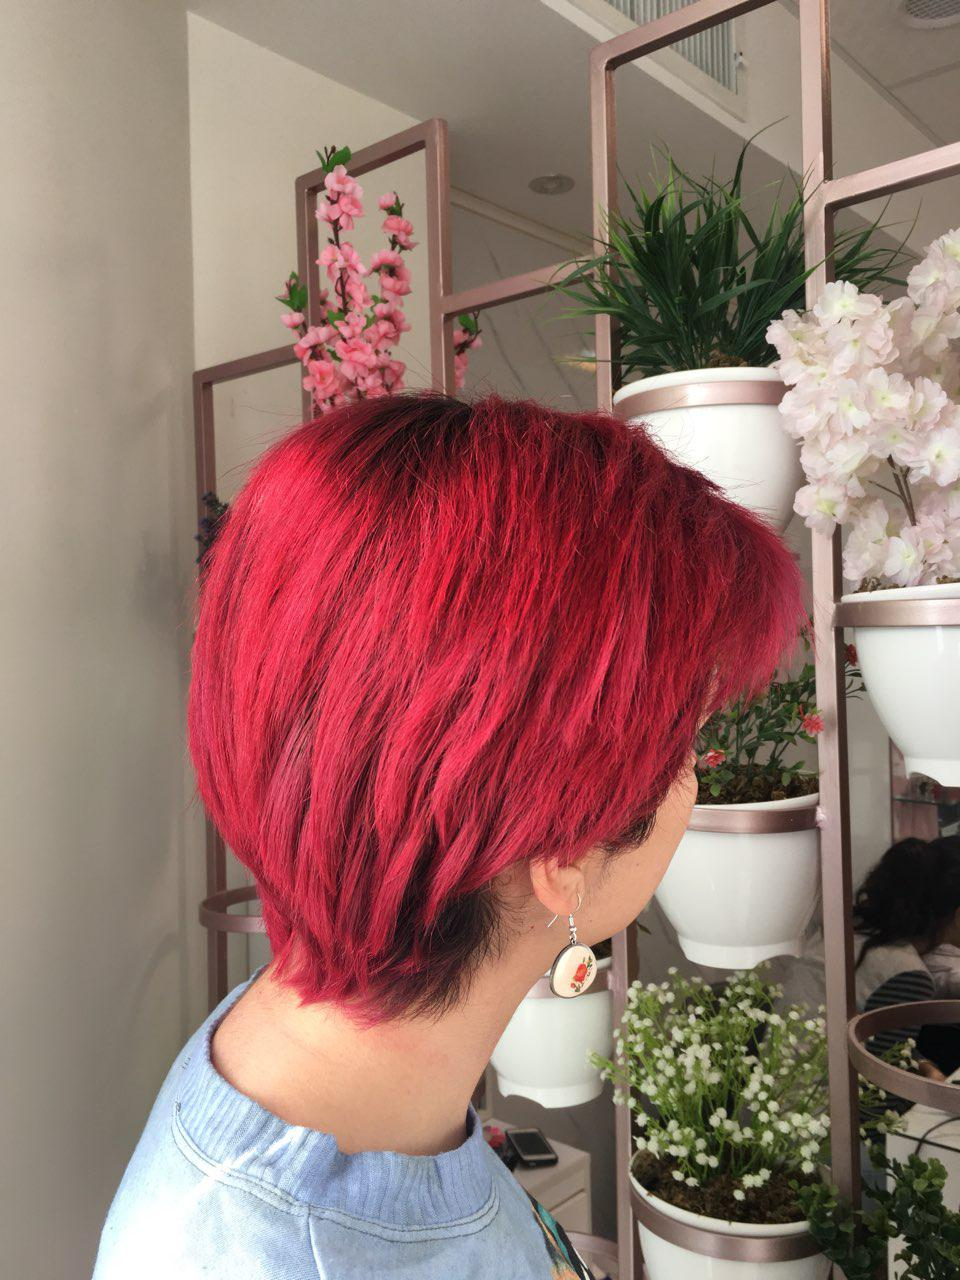 رنگ مو قرمز فانتزی